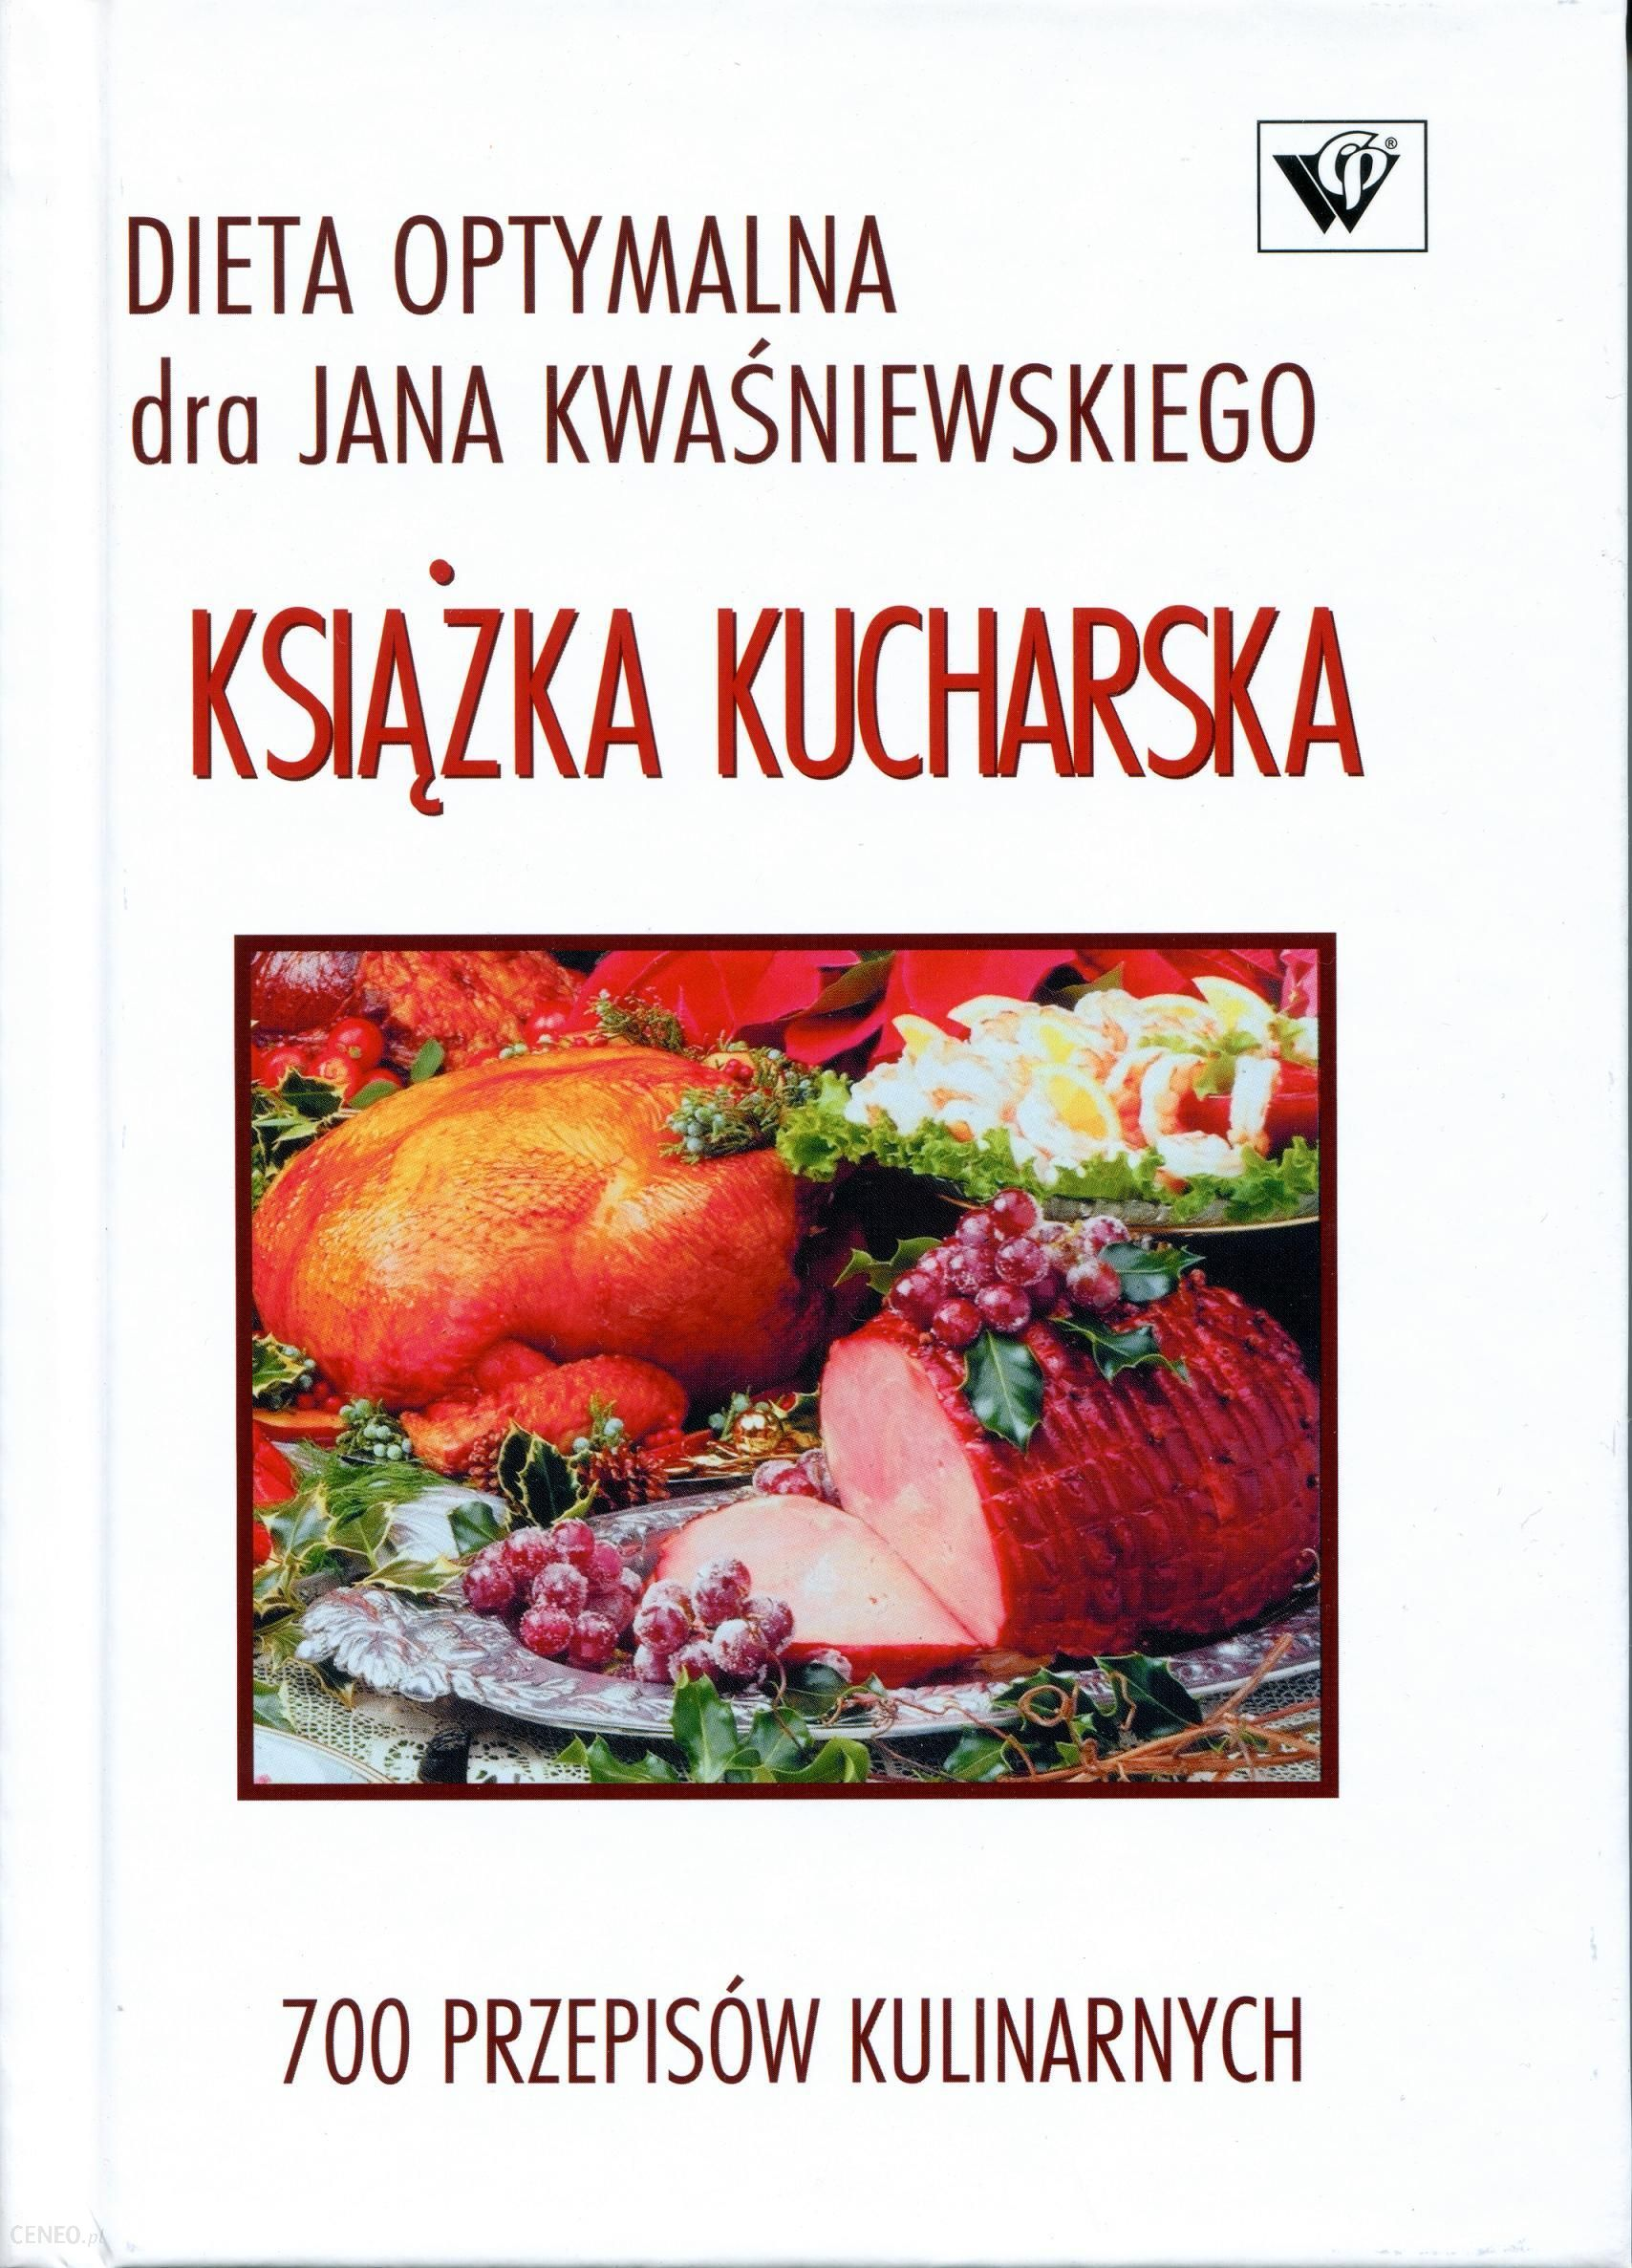 Dieta Optymalna Ksiazka Kucharska Ceny I Opinie Ceneo Pl